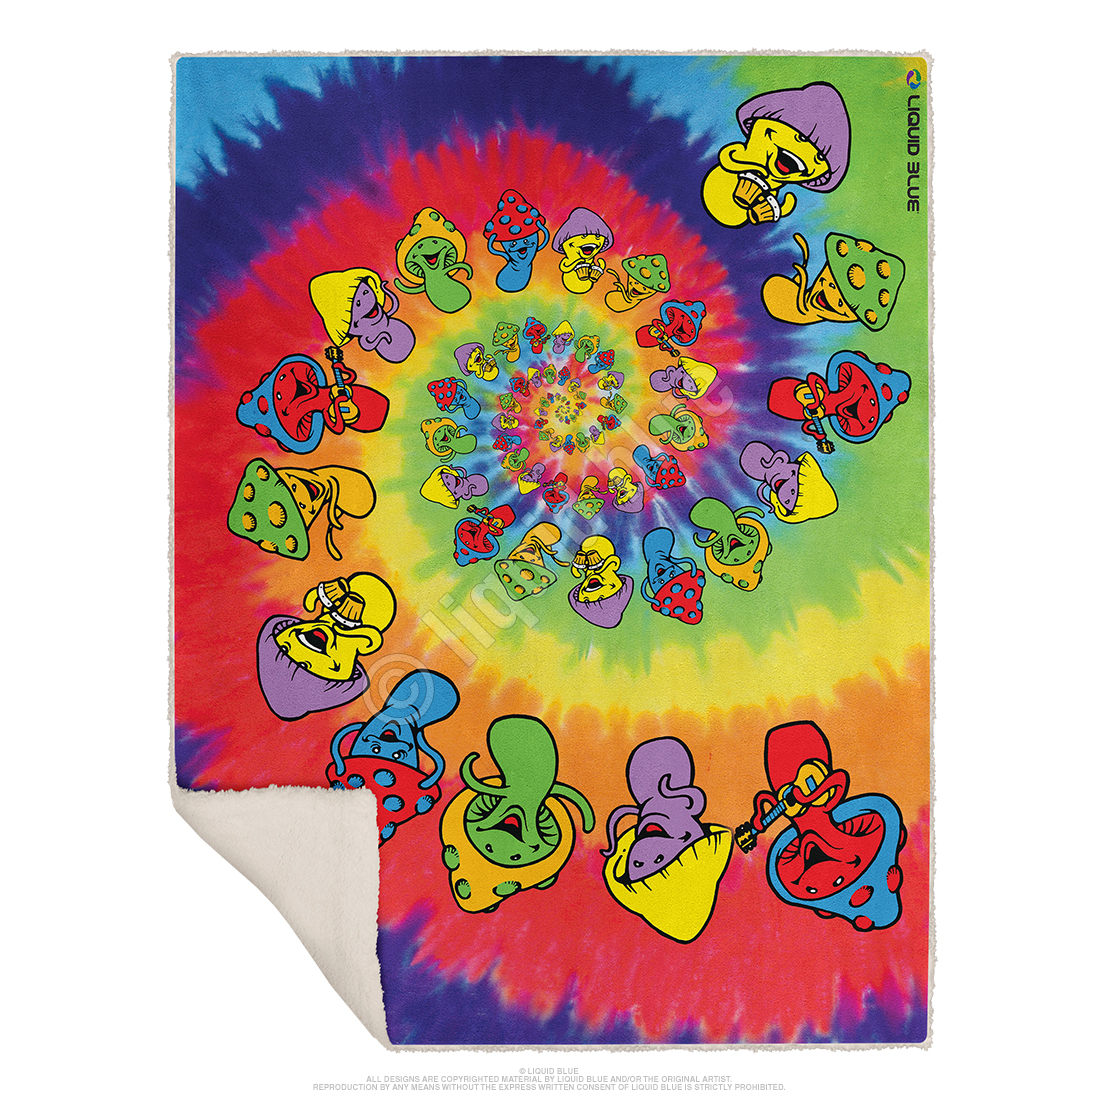 Spiral Shrooms Fleece Throw Blanket